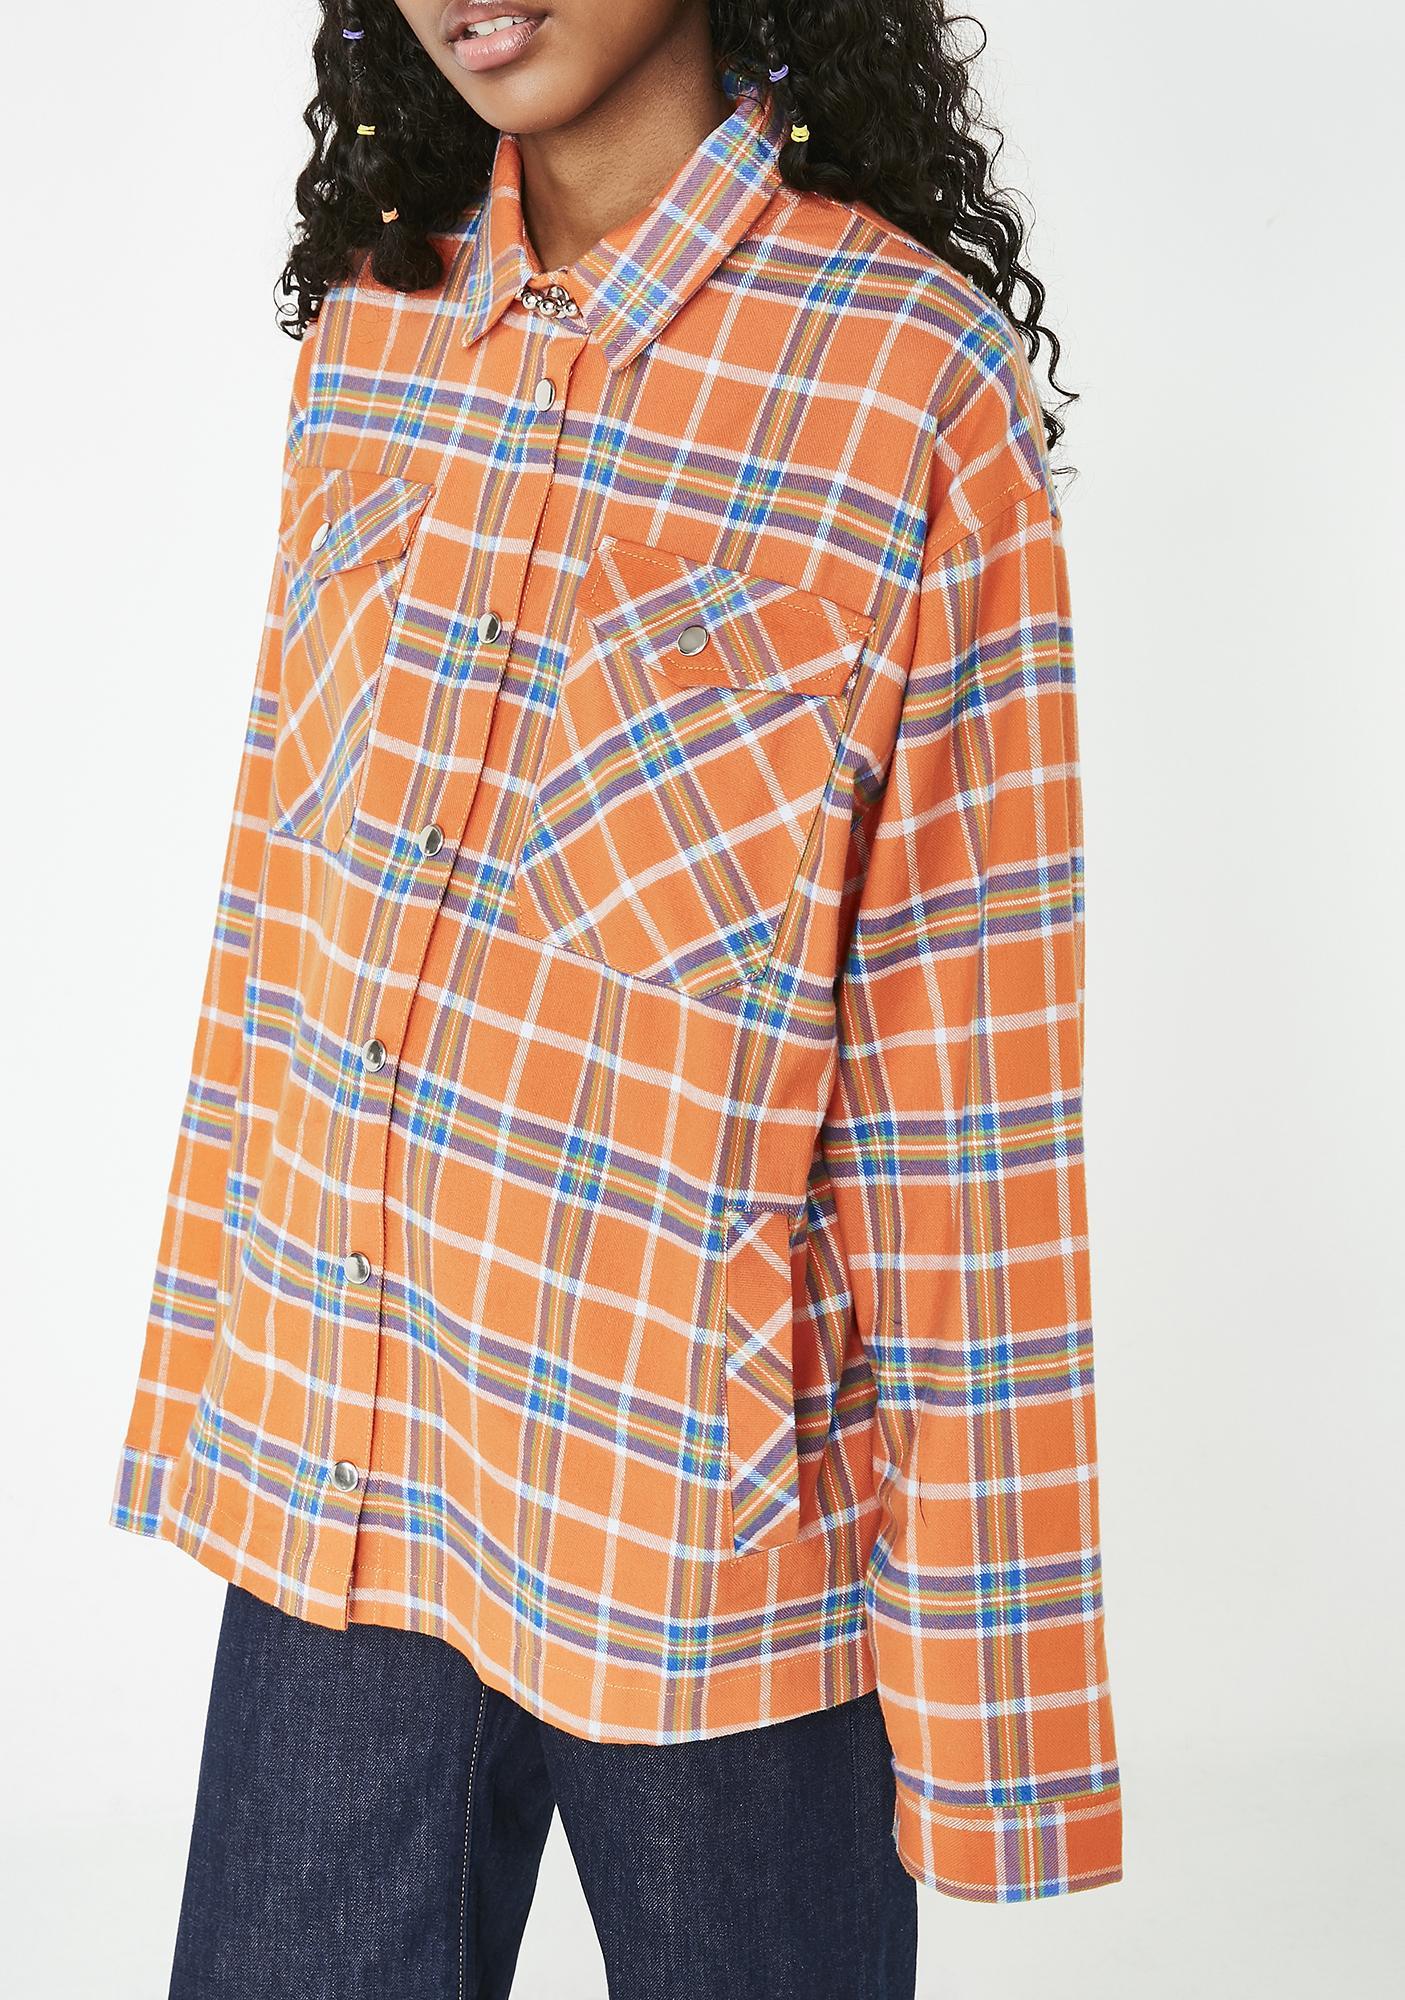 The Ragged Priest Wayward Shirt